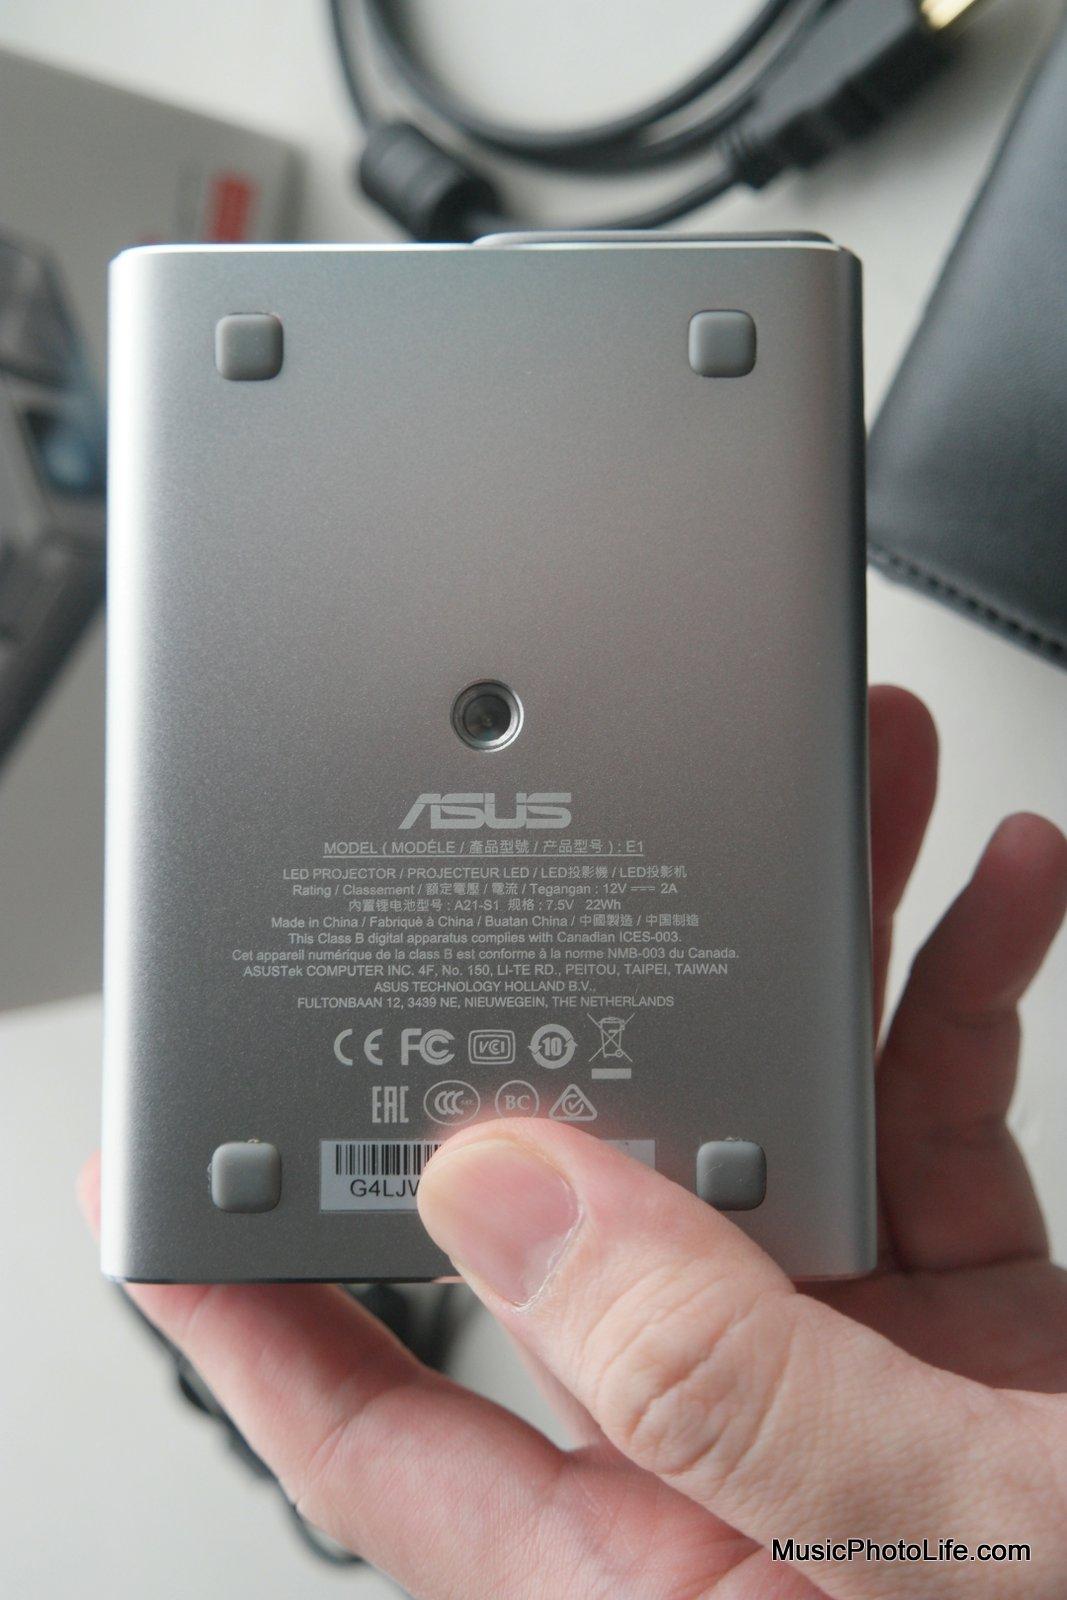 ASUS ZenBeam E1 projector with tripod socket